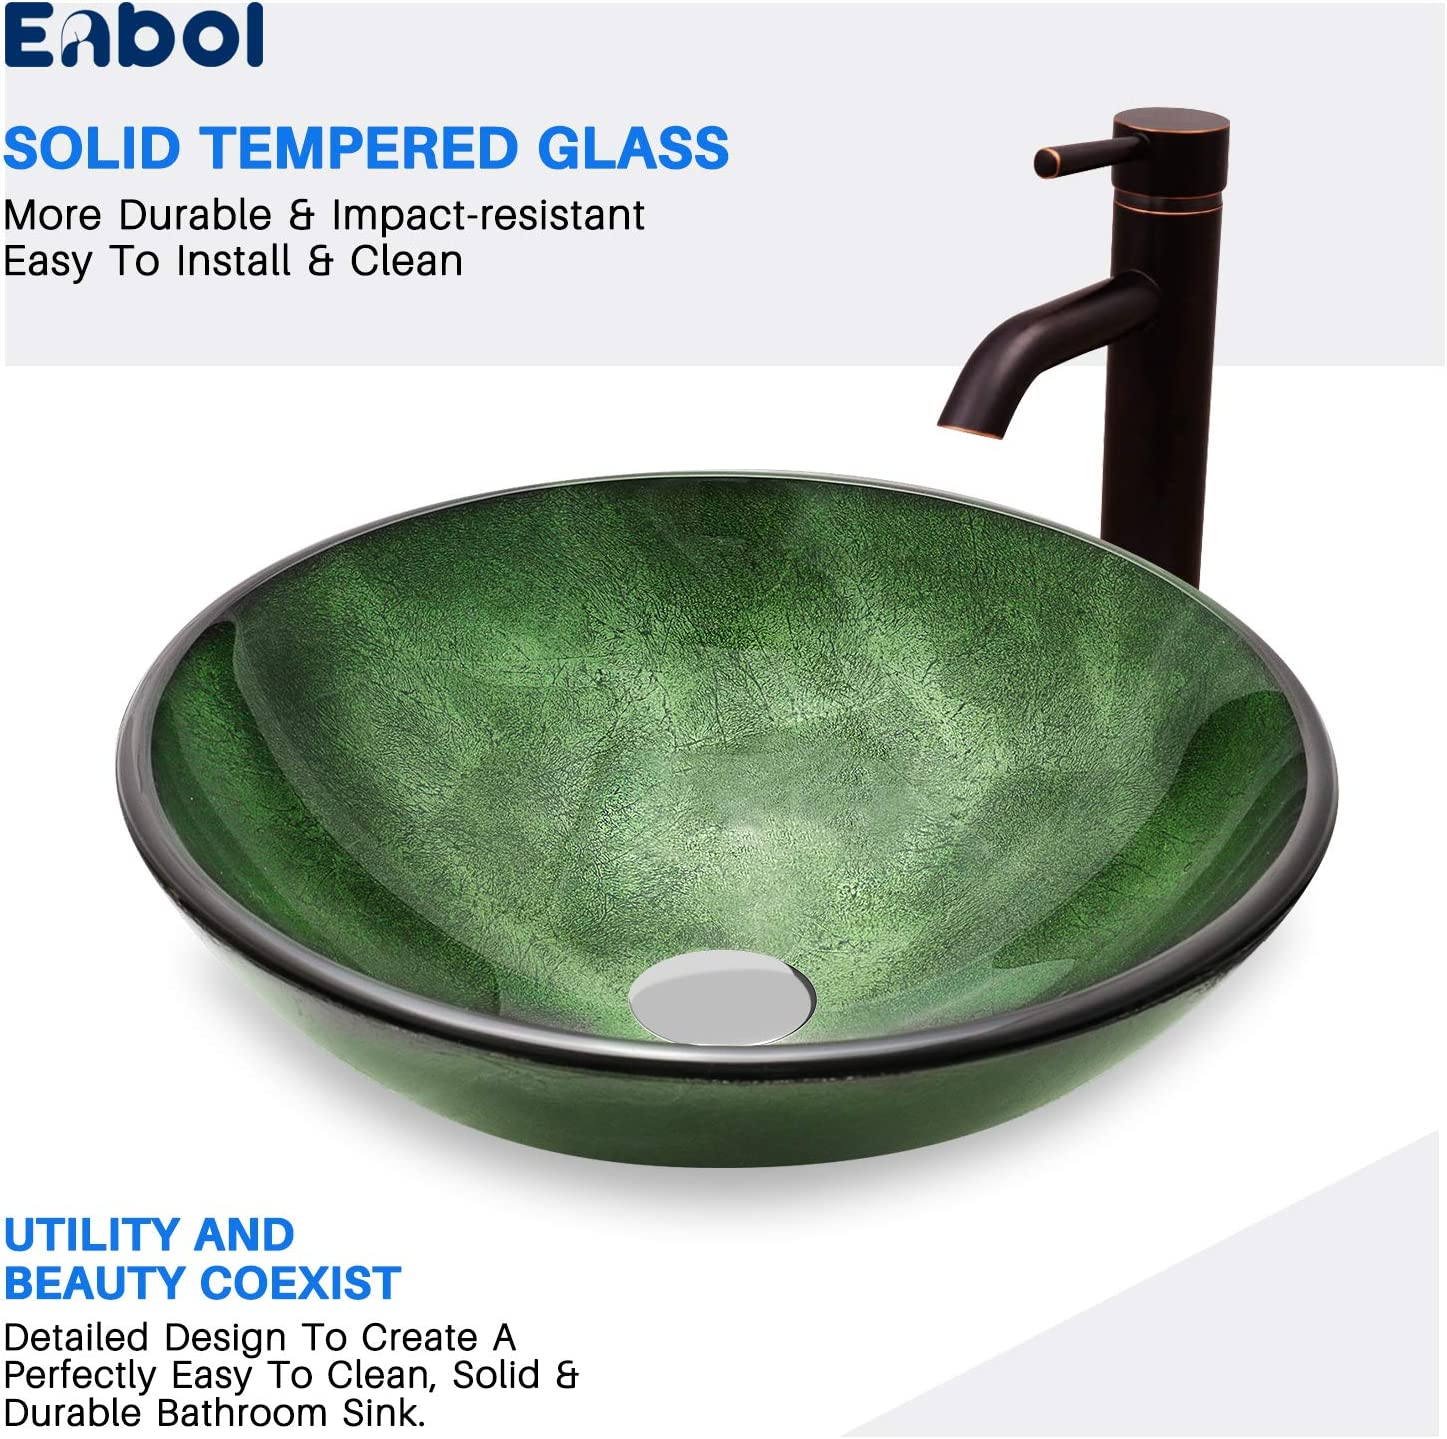 Kitchen & Bath Fixtures Vessel Sinks installsolar.com.ng Enbol EGS ...